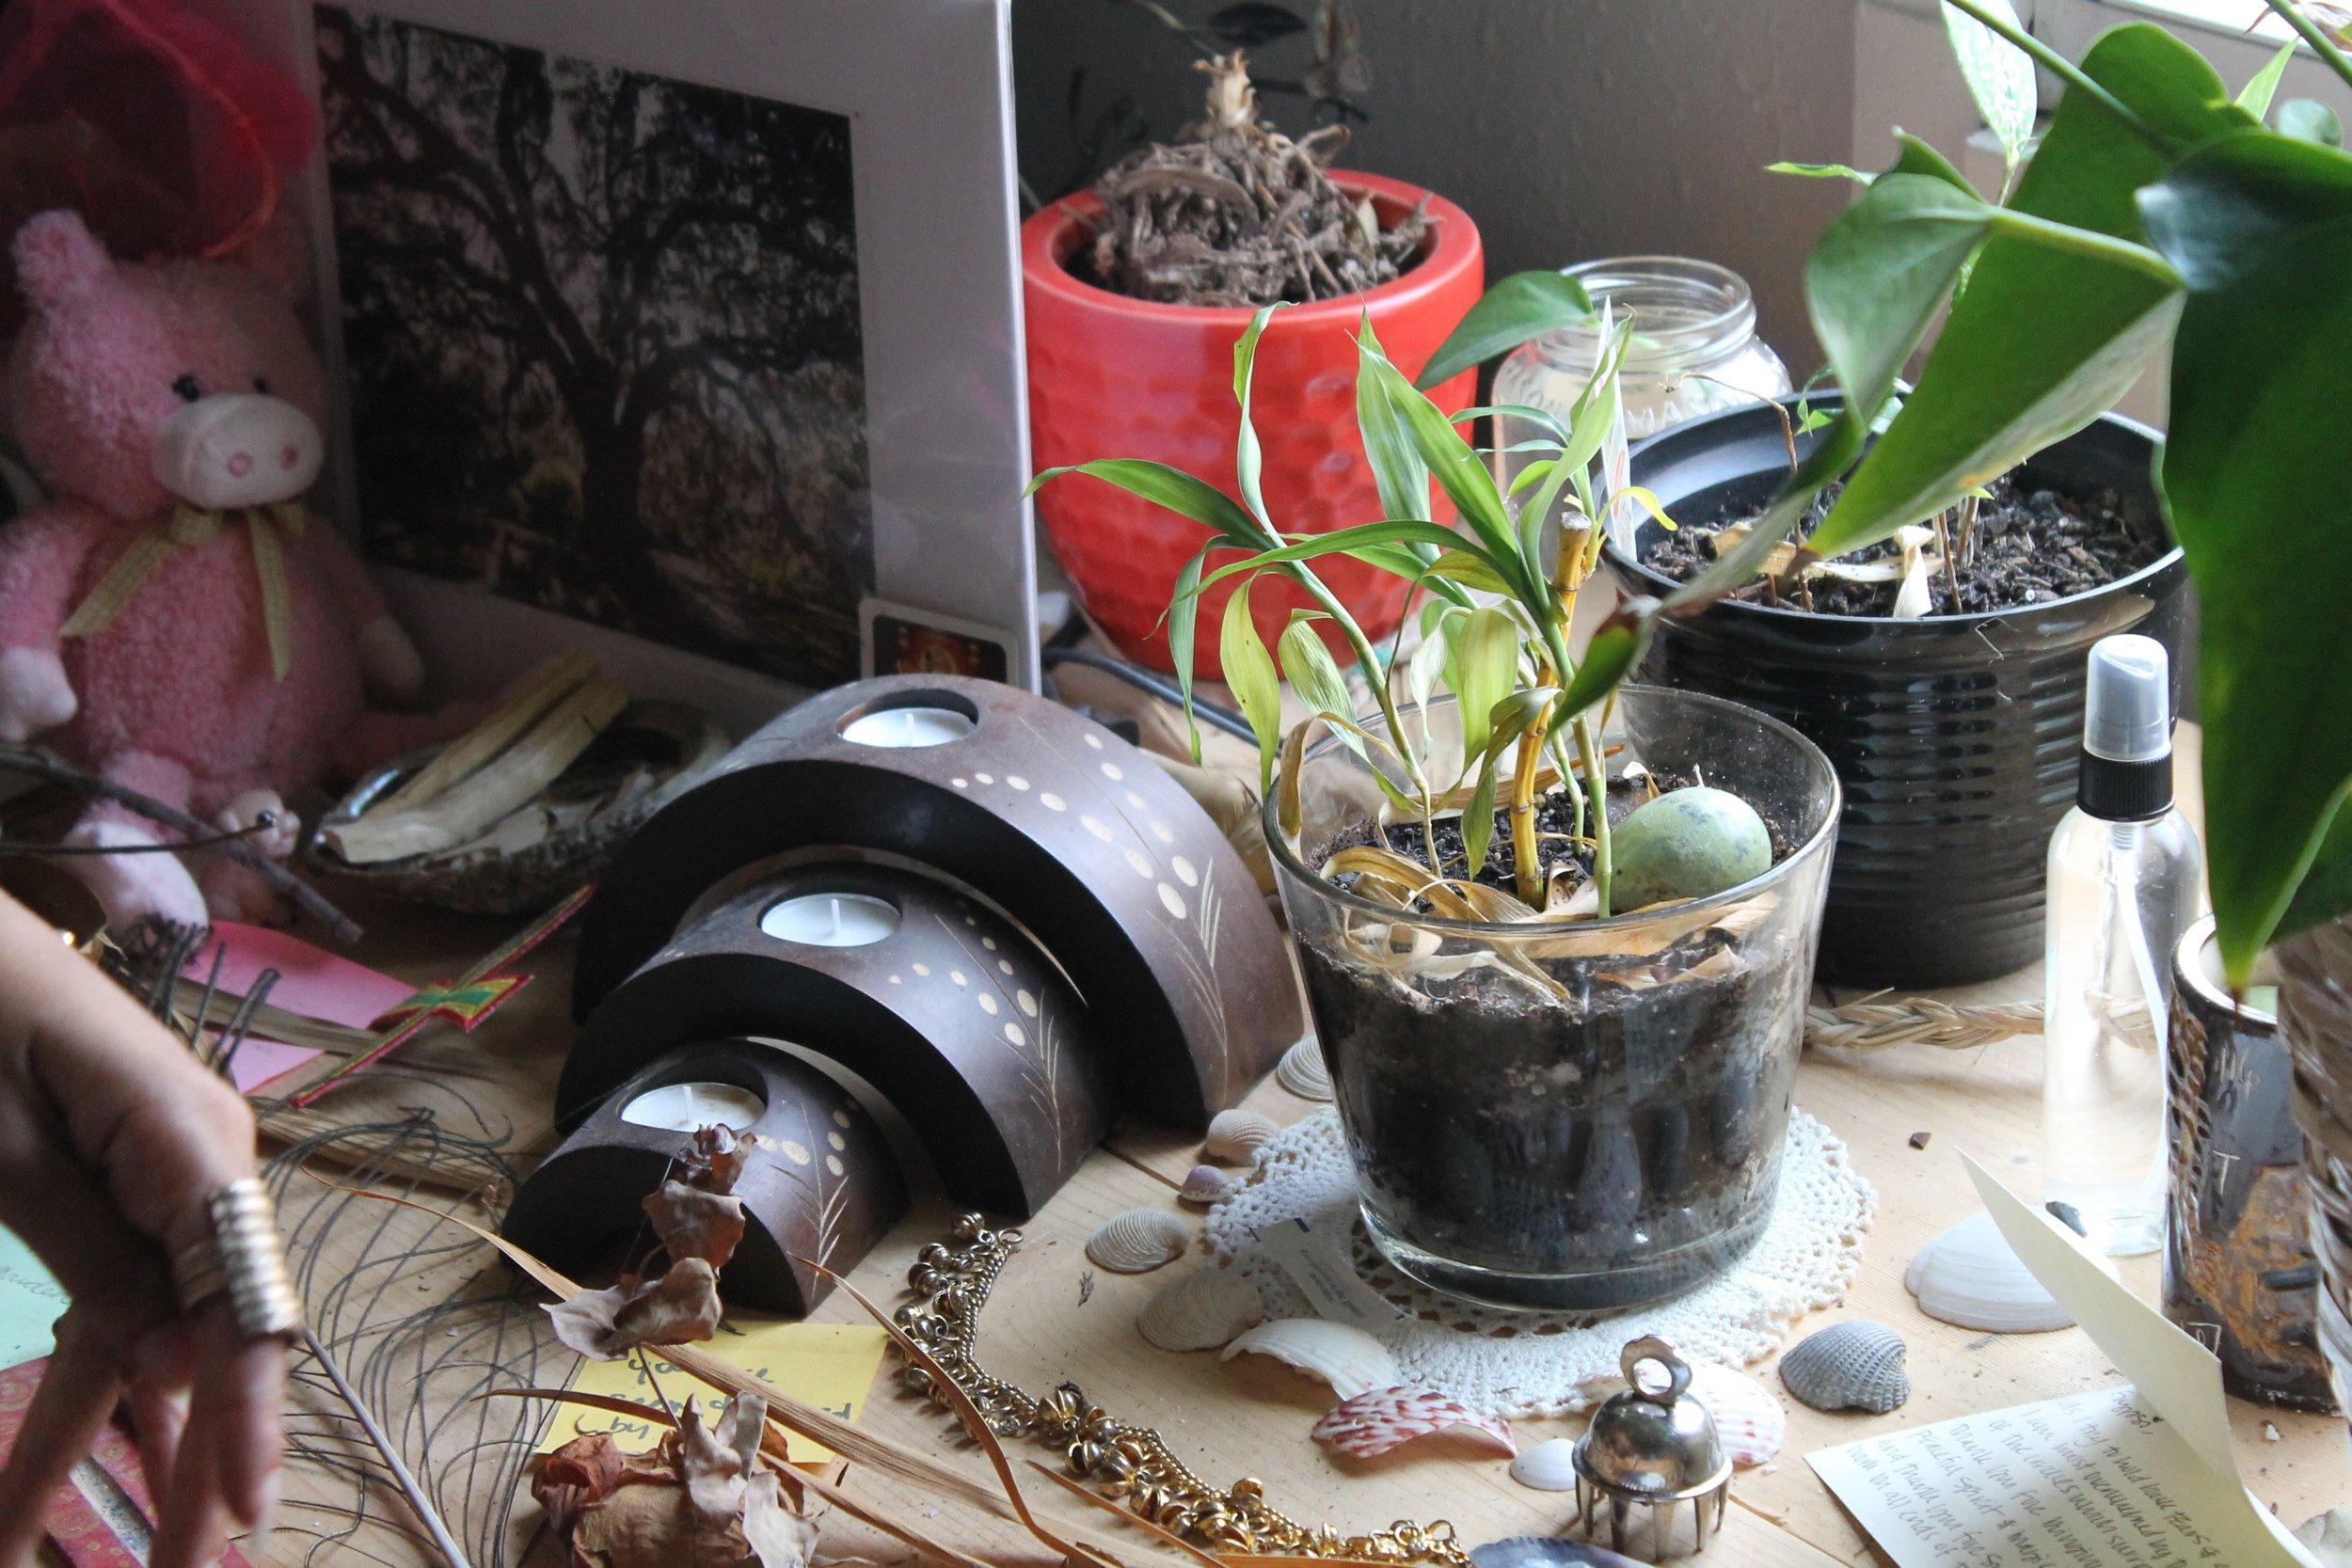 8a842-blackpeoplewithplants_gypsi_collectionofcollectionsblackpeoplewithplants_gypsi_collectionofcollections.jpg